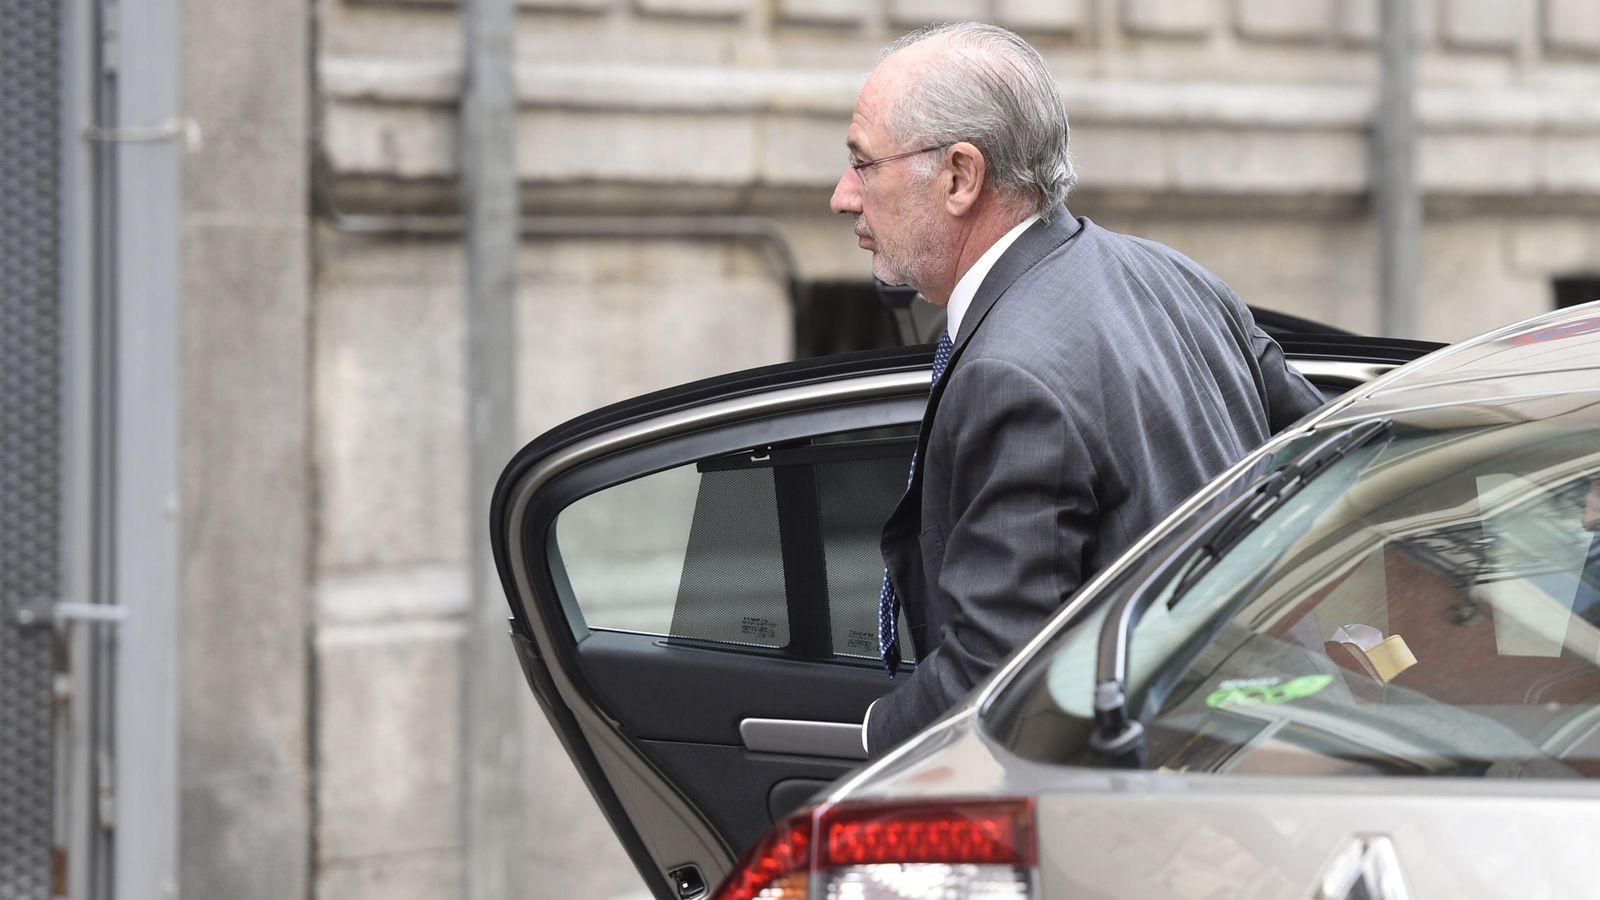 Noticias de bankia rato vuelve a los juzgados de for Bankia oficina internet entrar directo